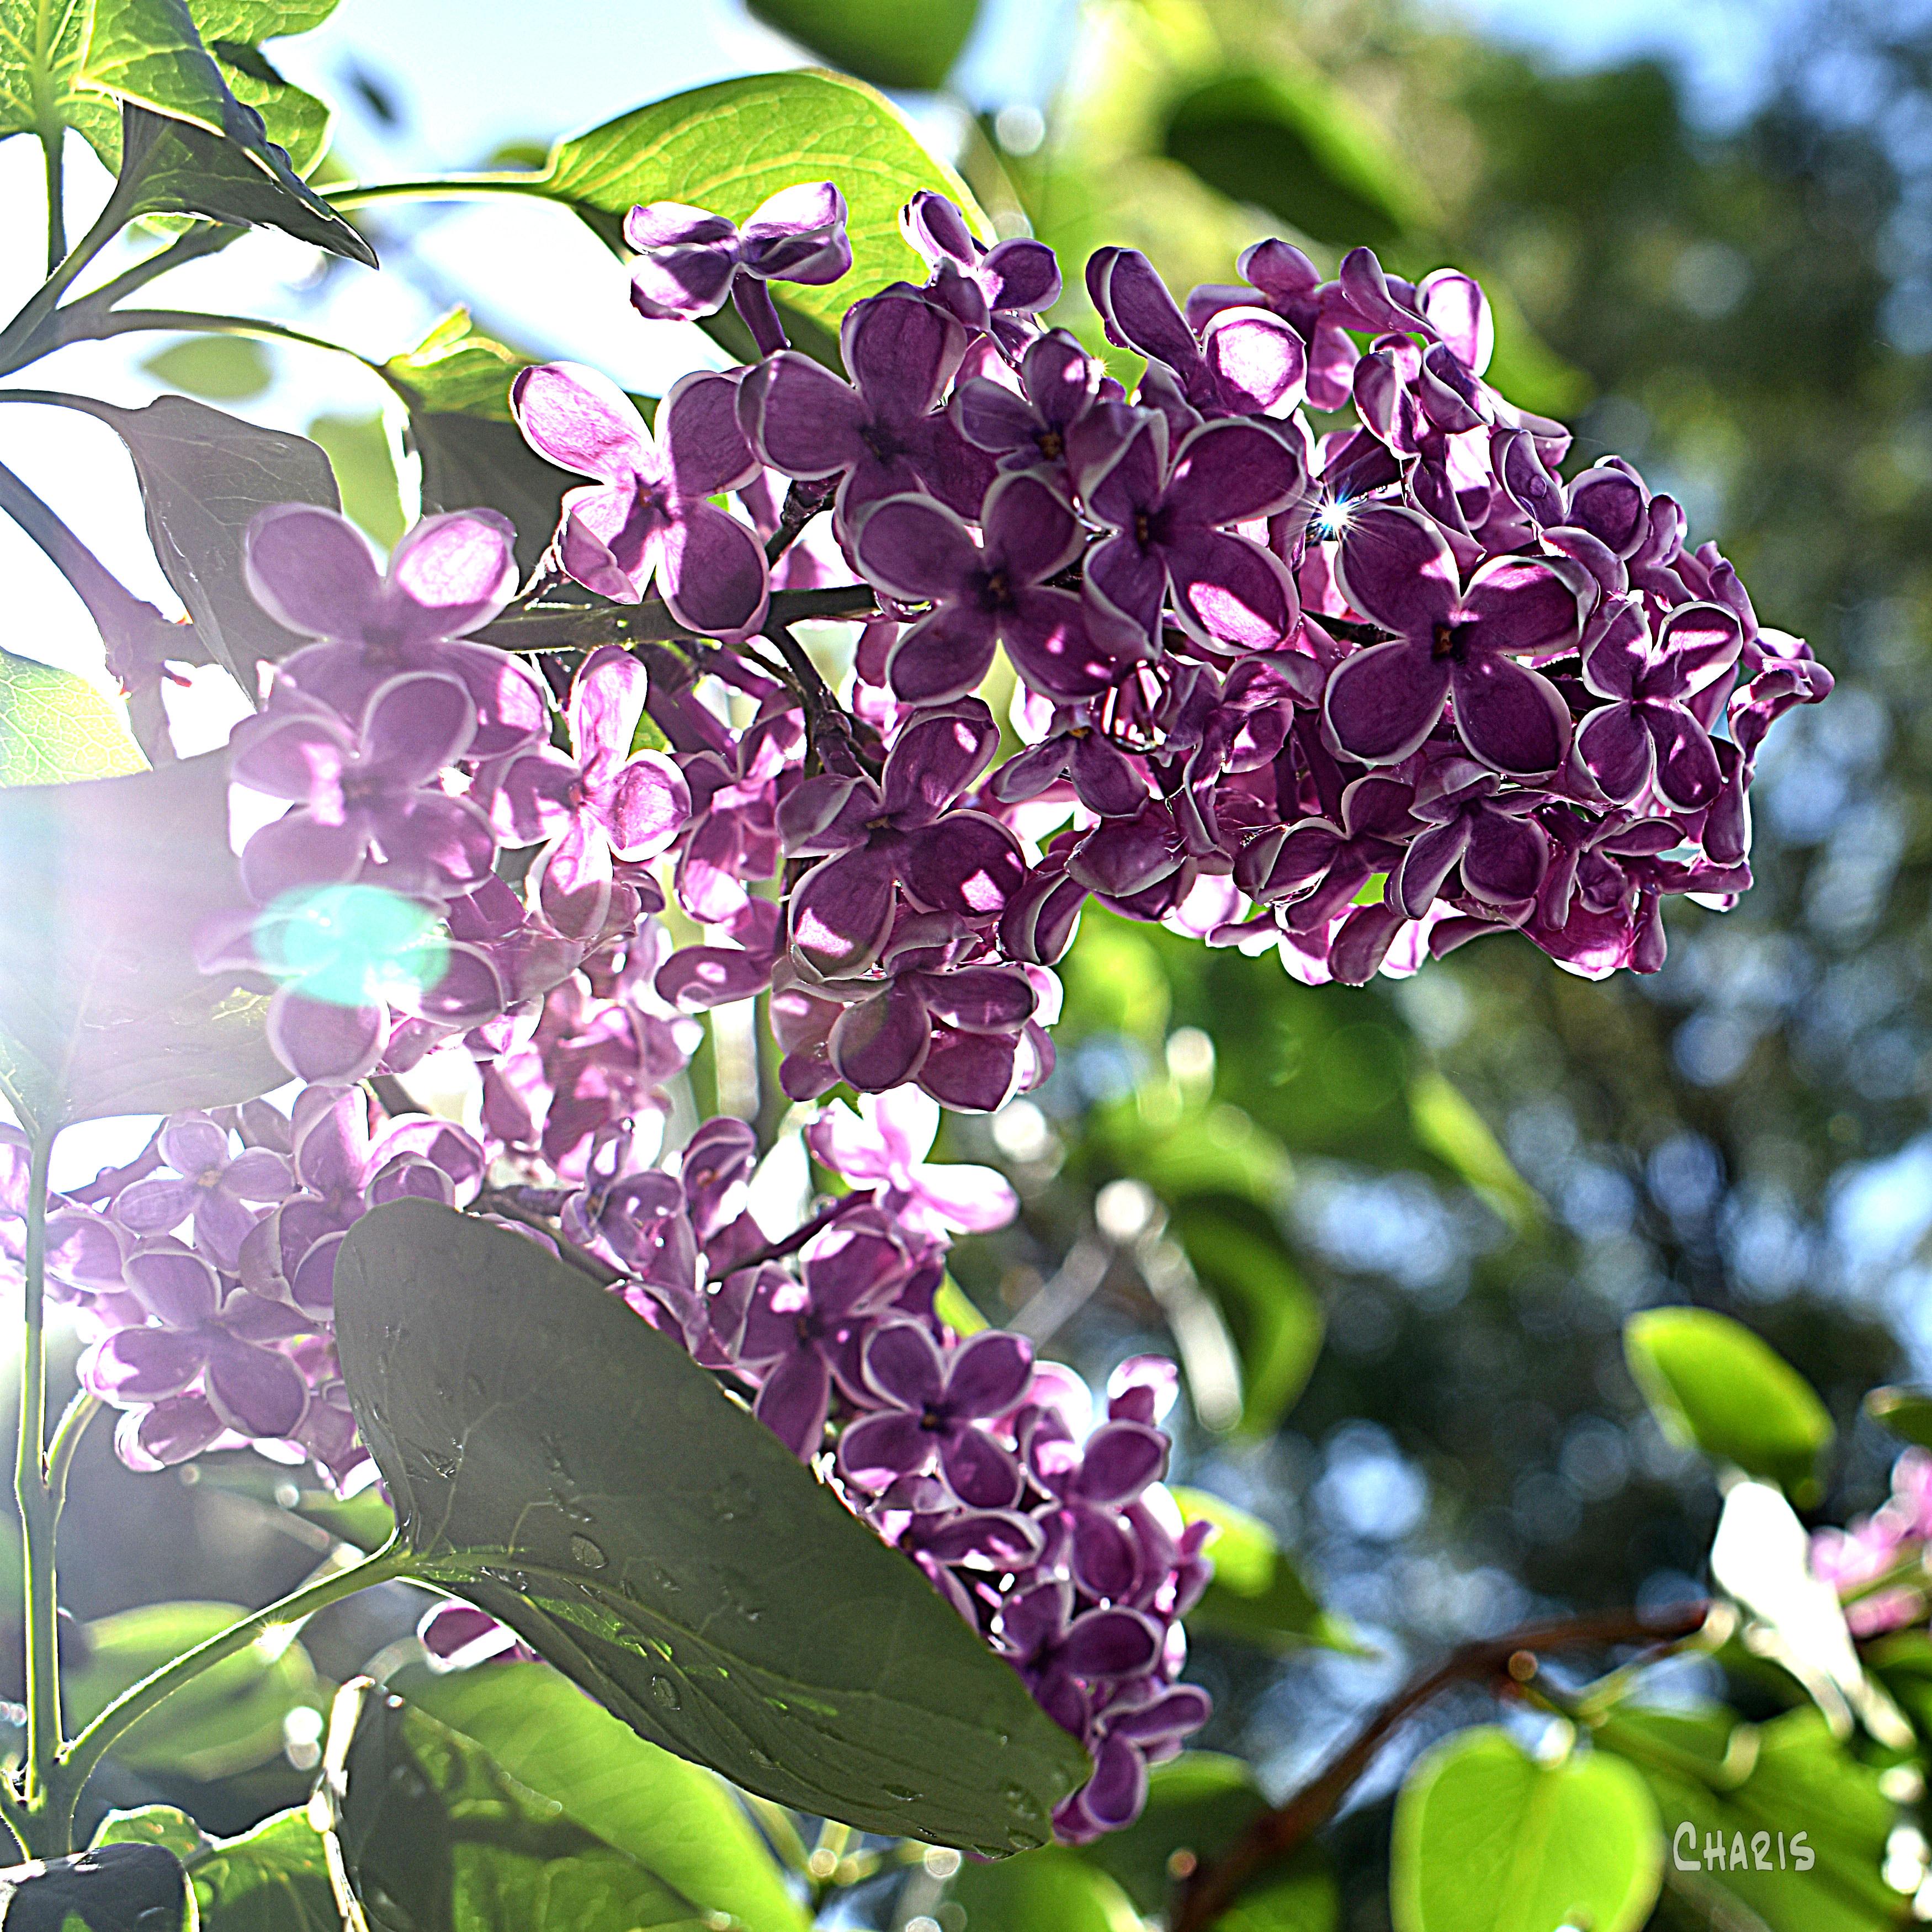 lilacs dark purple dq ch crop DSC_0005 (2)